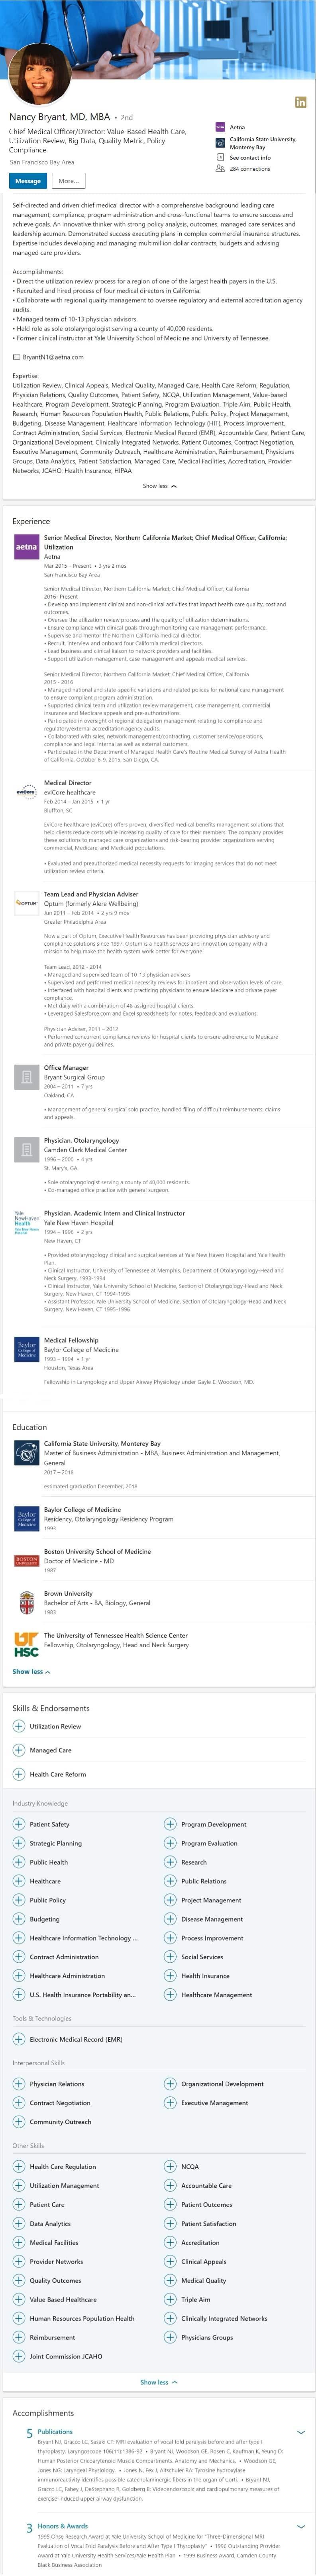 Linkedin profile example health care doctor